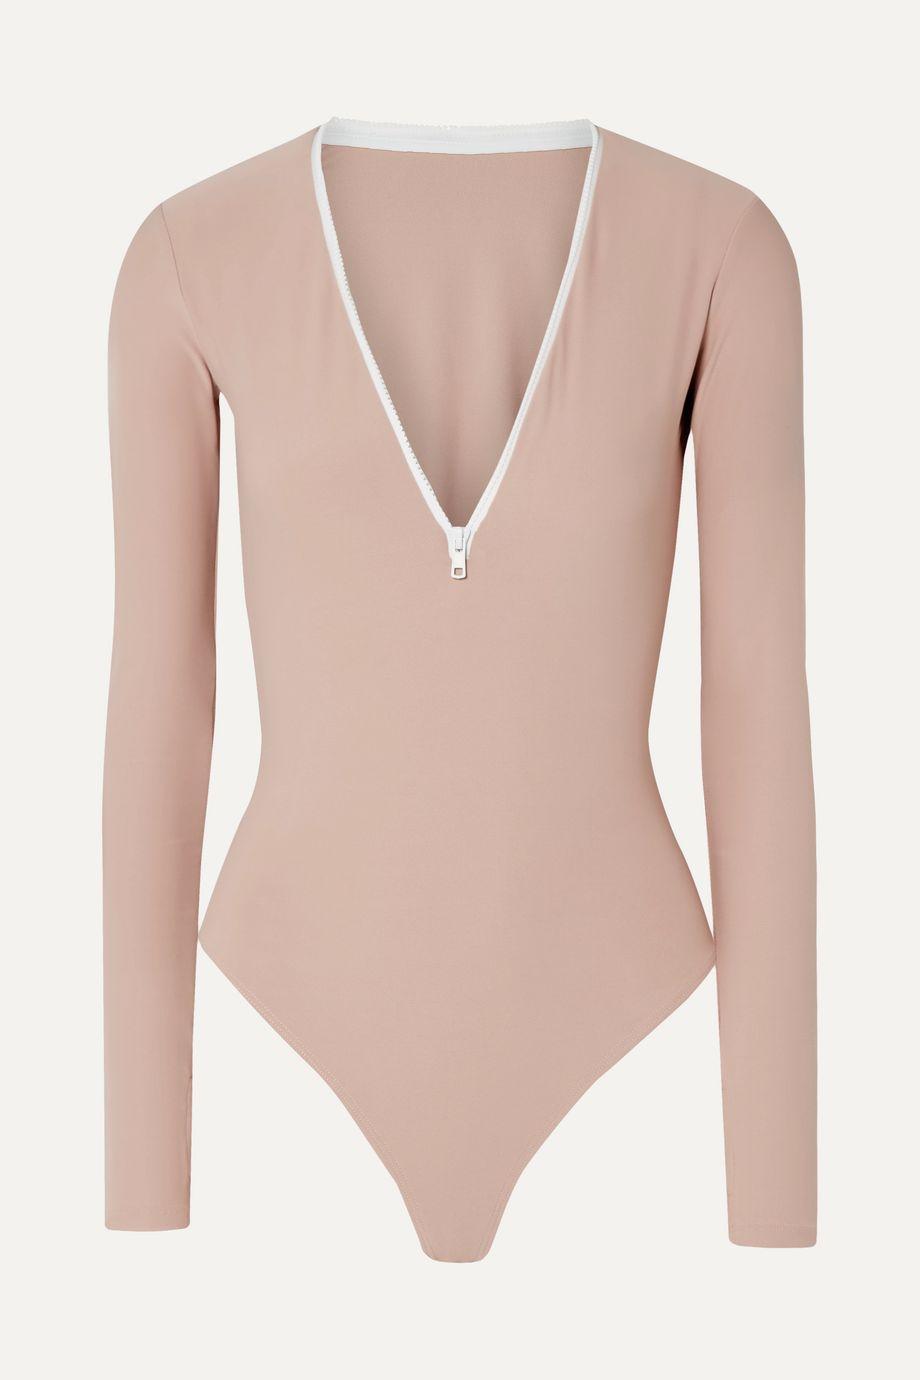 Alix NYC Spruce stretch-jersey thong bodysuit